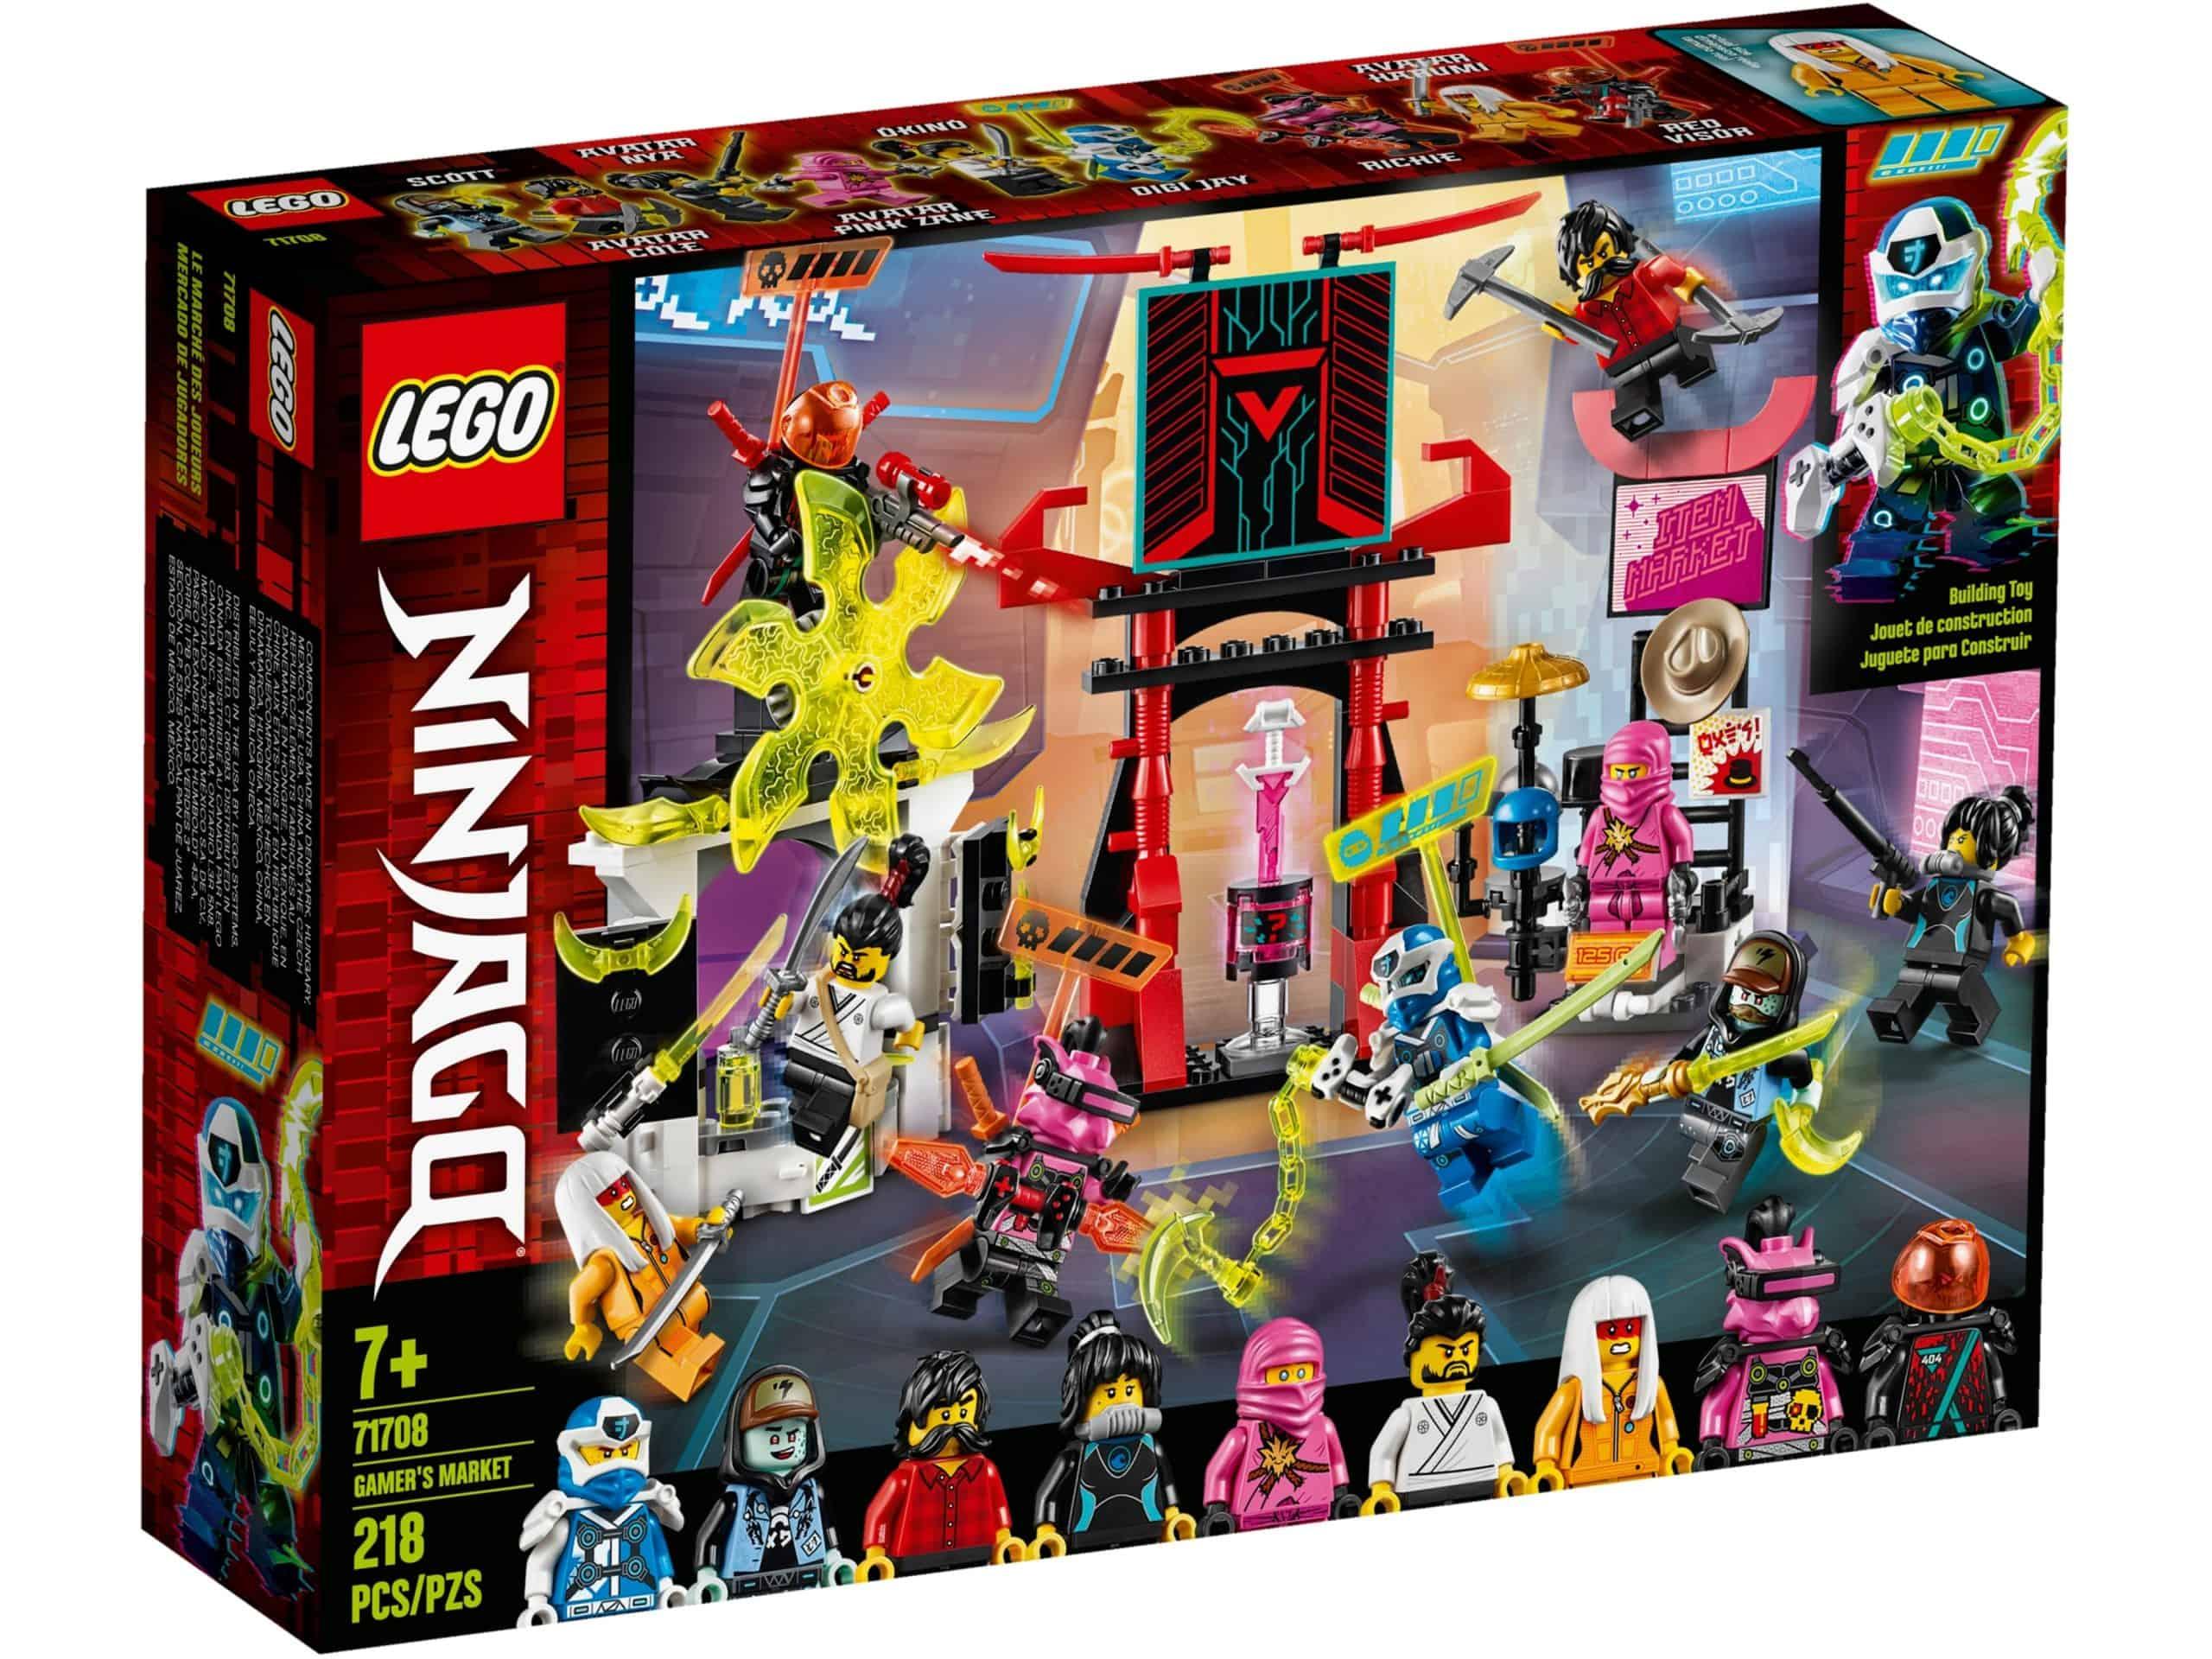 lego 71708 spillermarked scaled